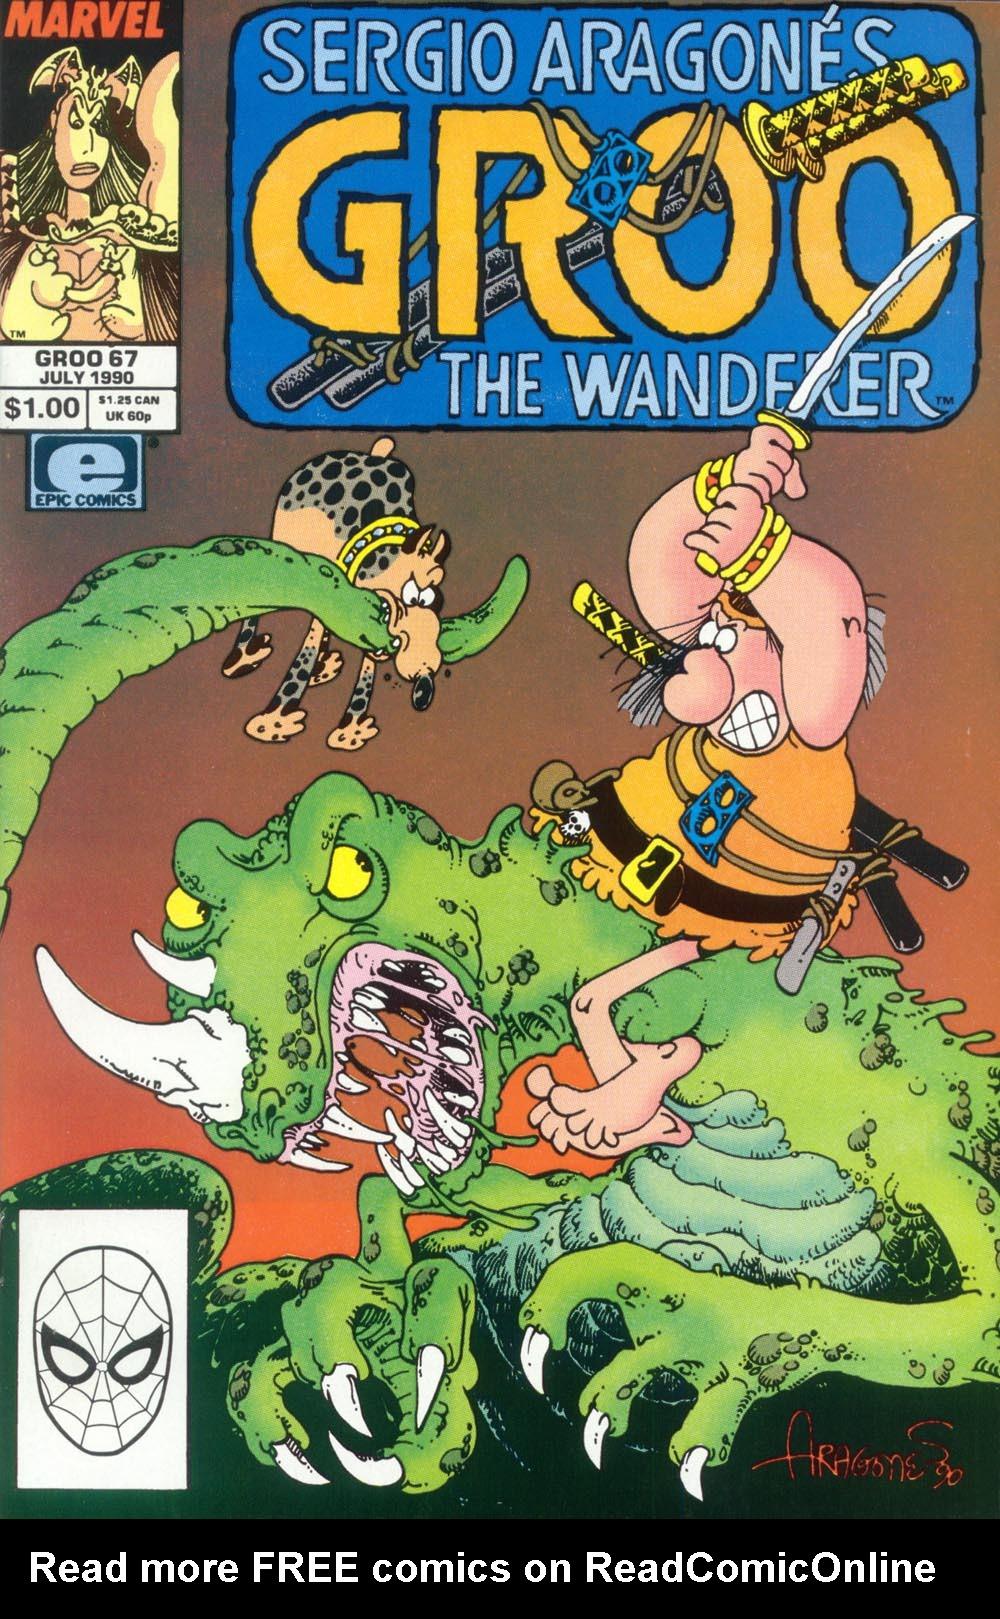 Read online Sergio Aragonés Groo the Wanderer comic -  Issue #67 - 1